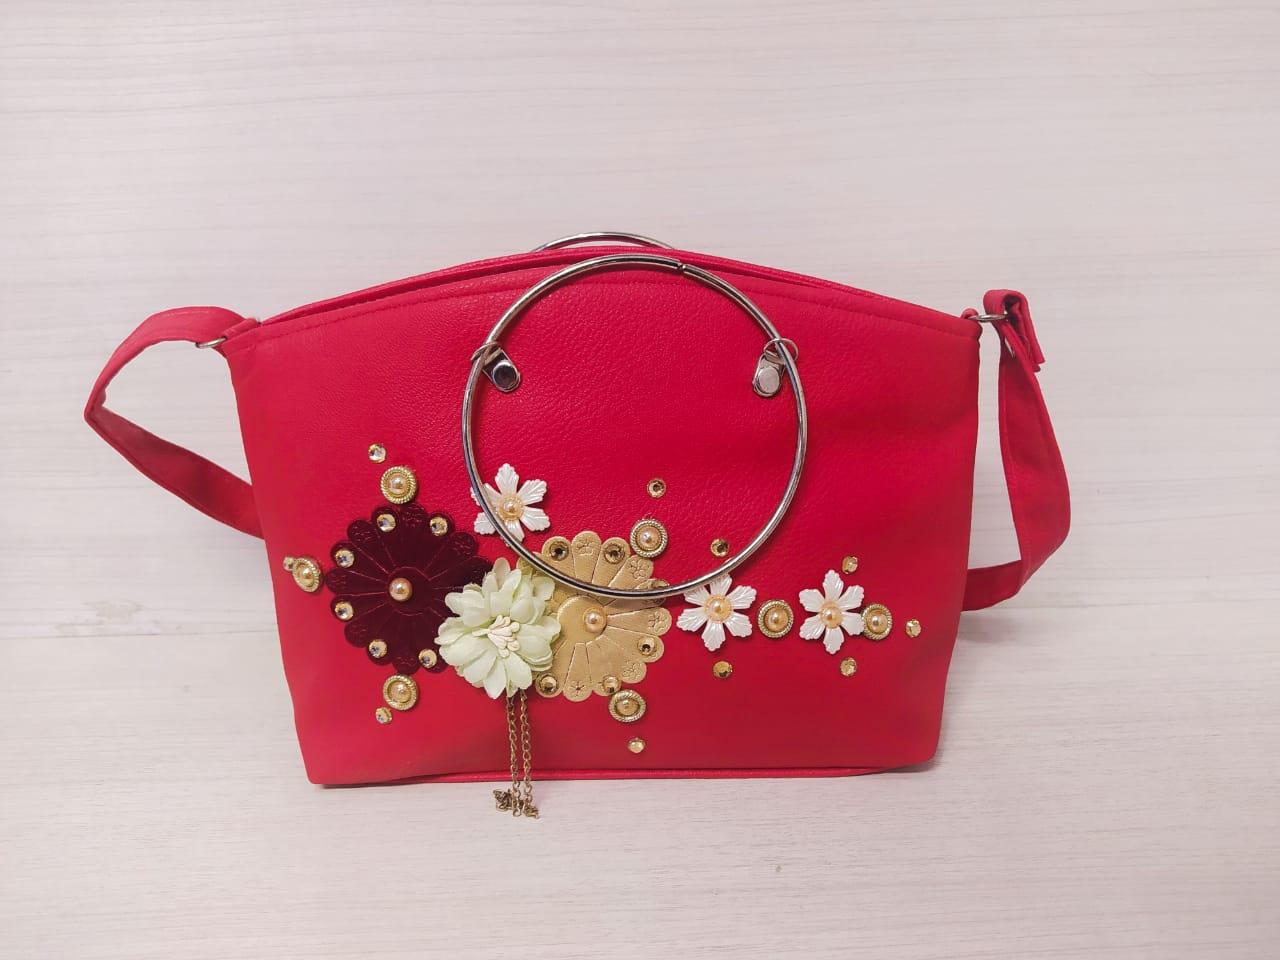 Women Pearl Flower Bags Evening Bag Purse Handbag For Wedding Chain Bag For Dinner Party, Crossbody Shoulder Bags, Girls Messenger Bag